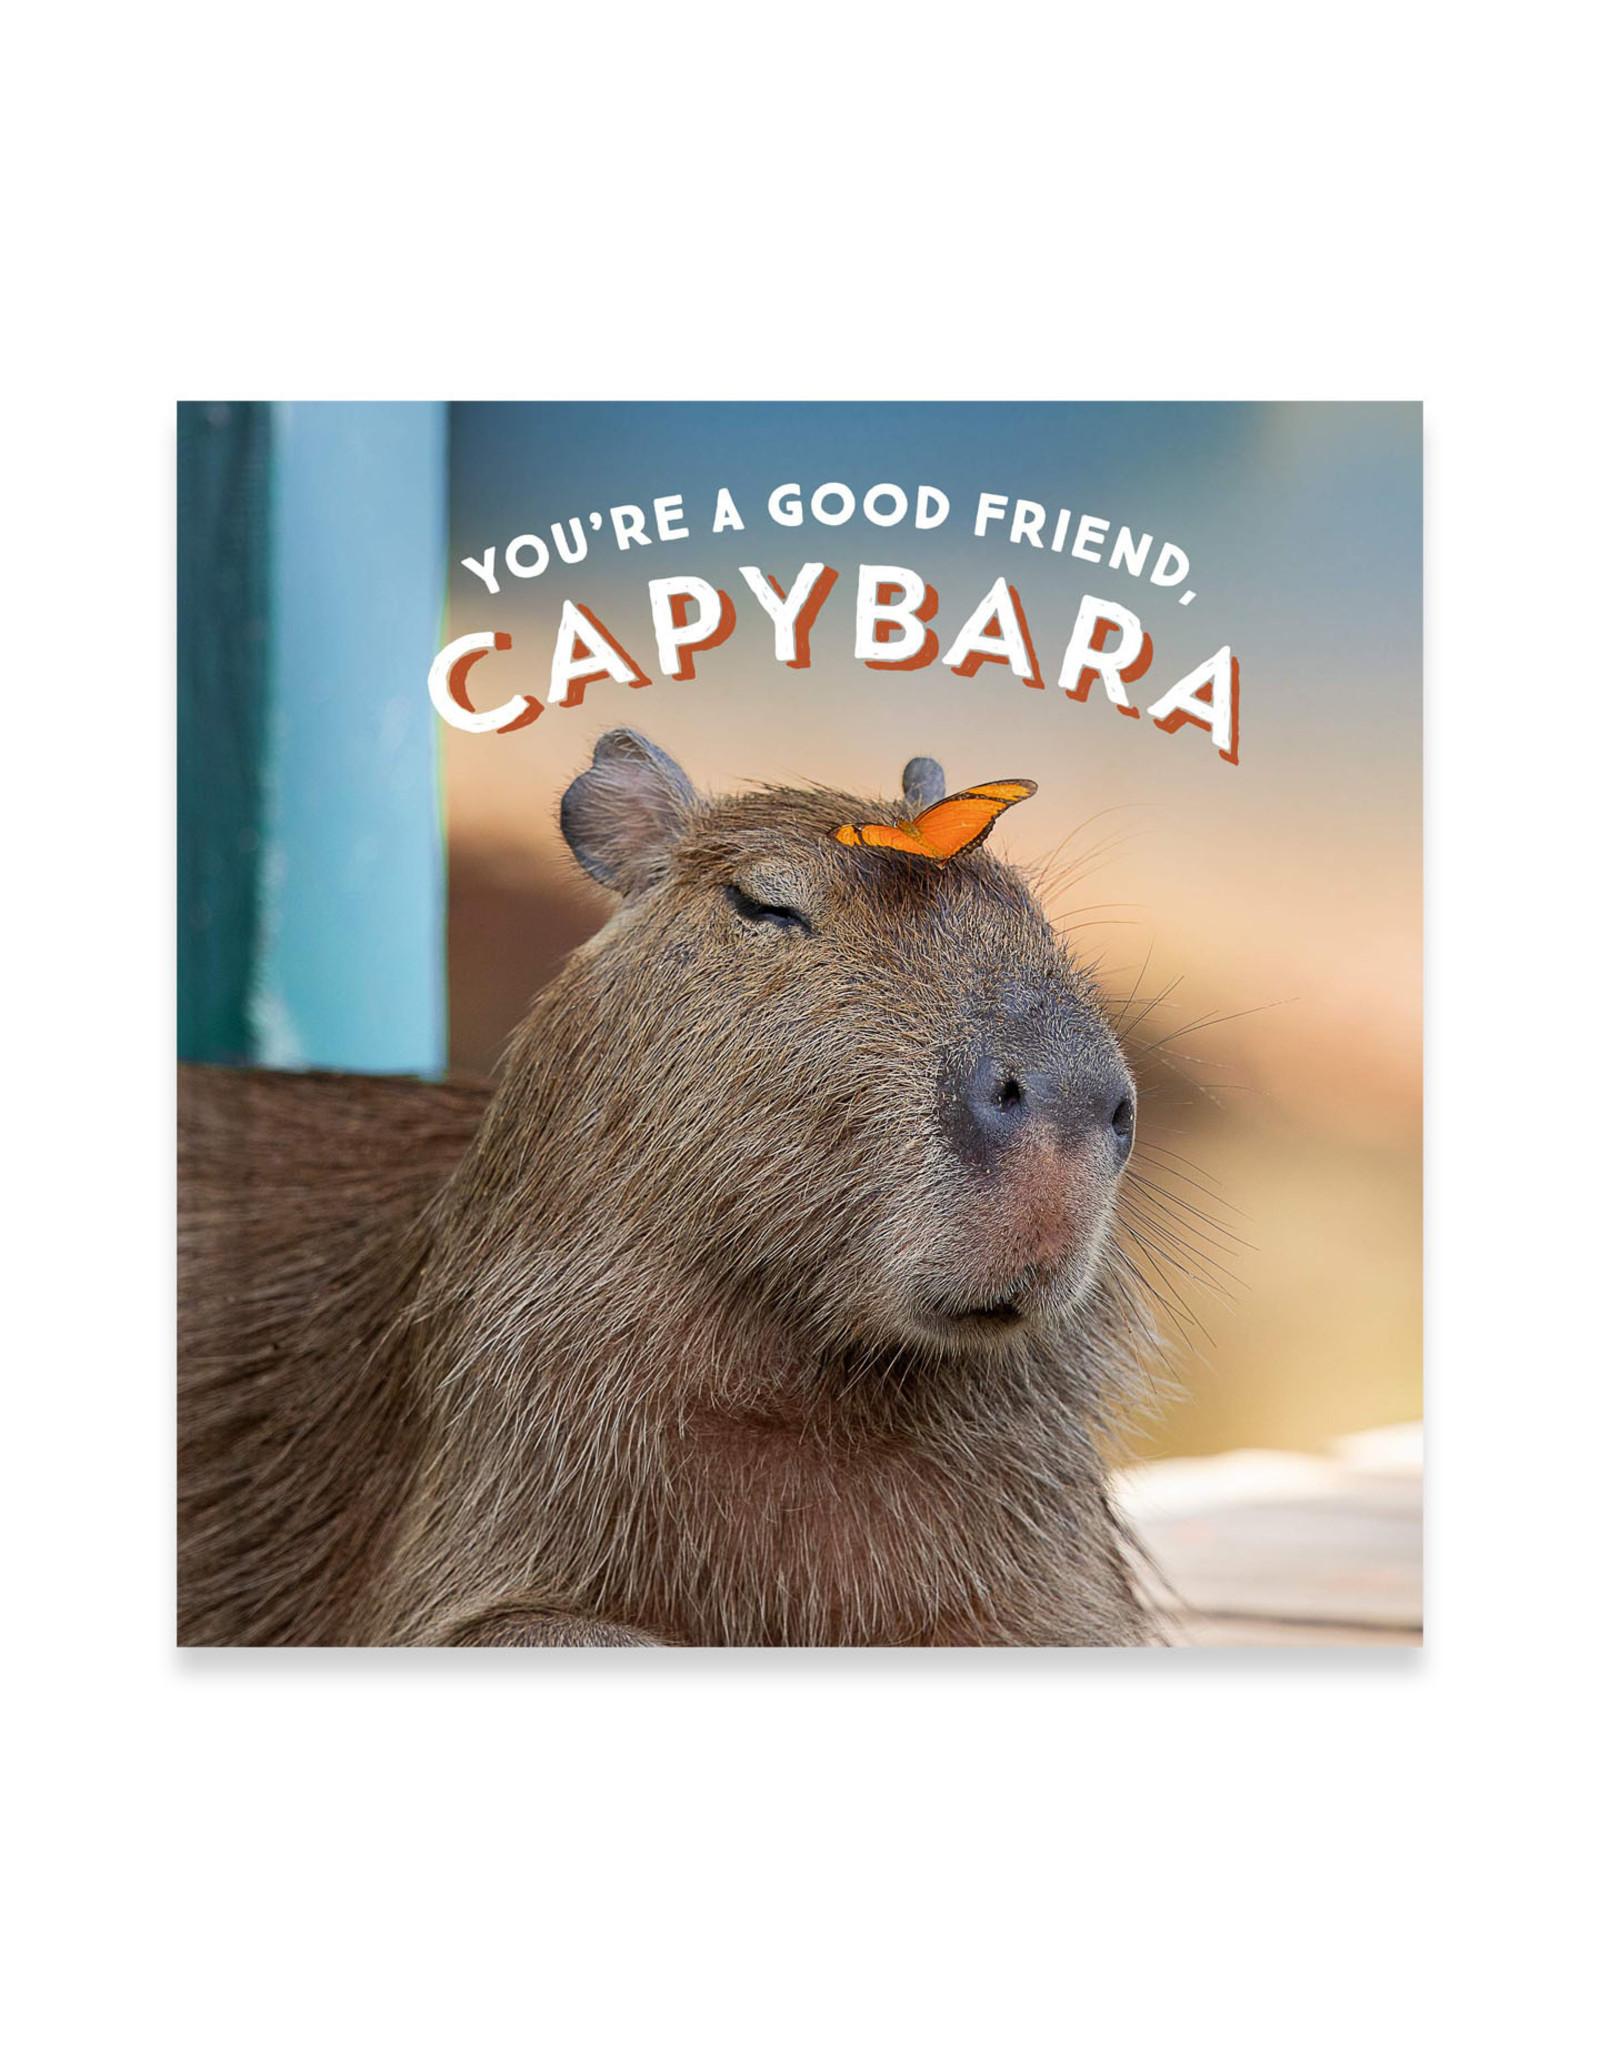 You're a Good Friend, Capybara